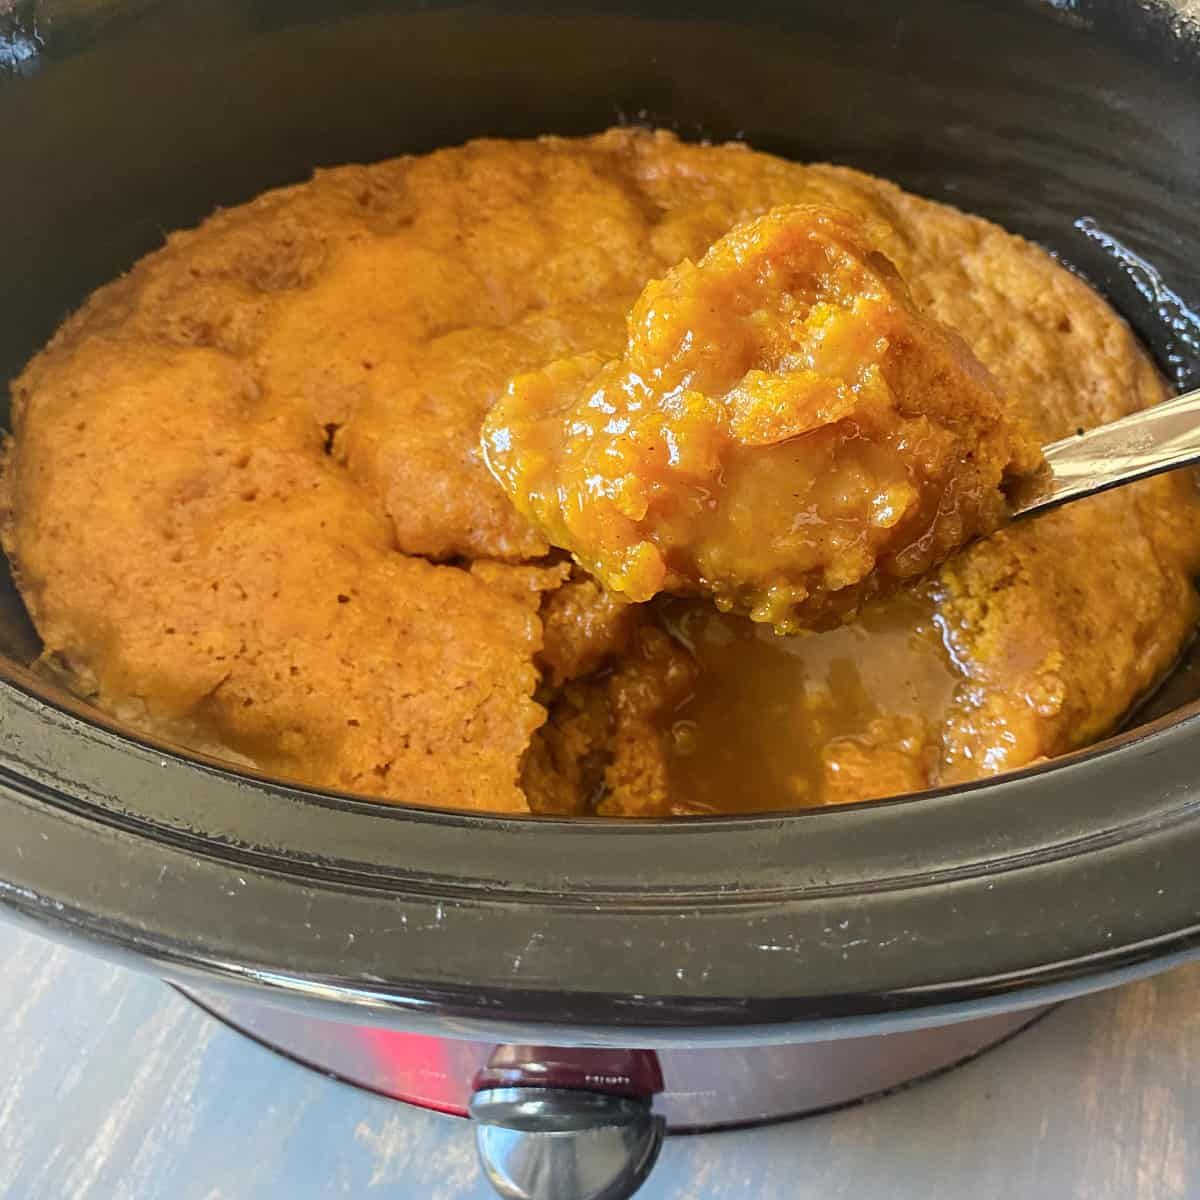 warm crockpot pumpkin cobbler on a spoon showing the pumpkin caramel sauce hiding underneath in the crockpot